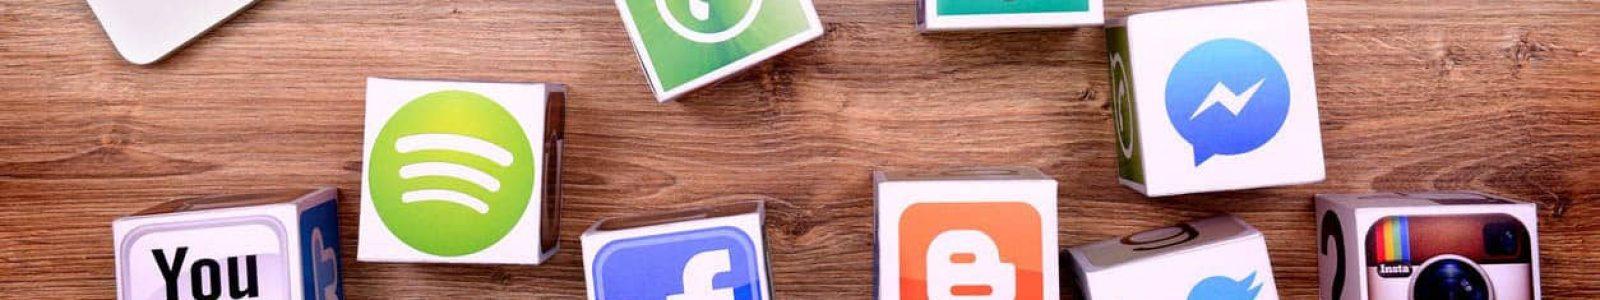 social-media-vinaros-seo